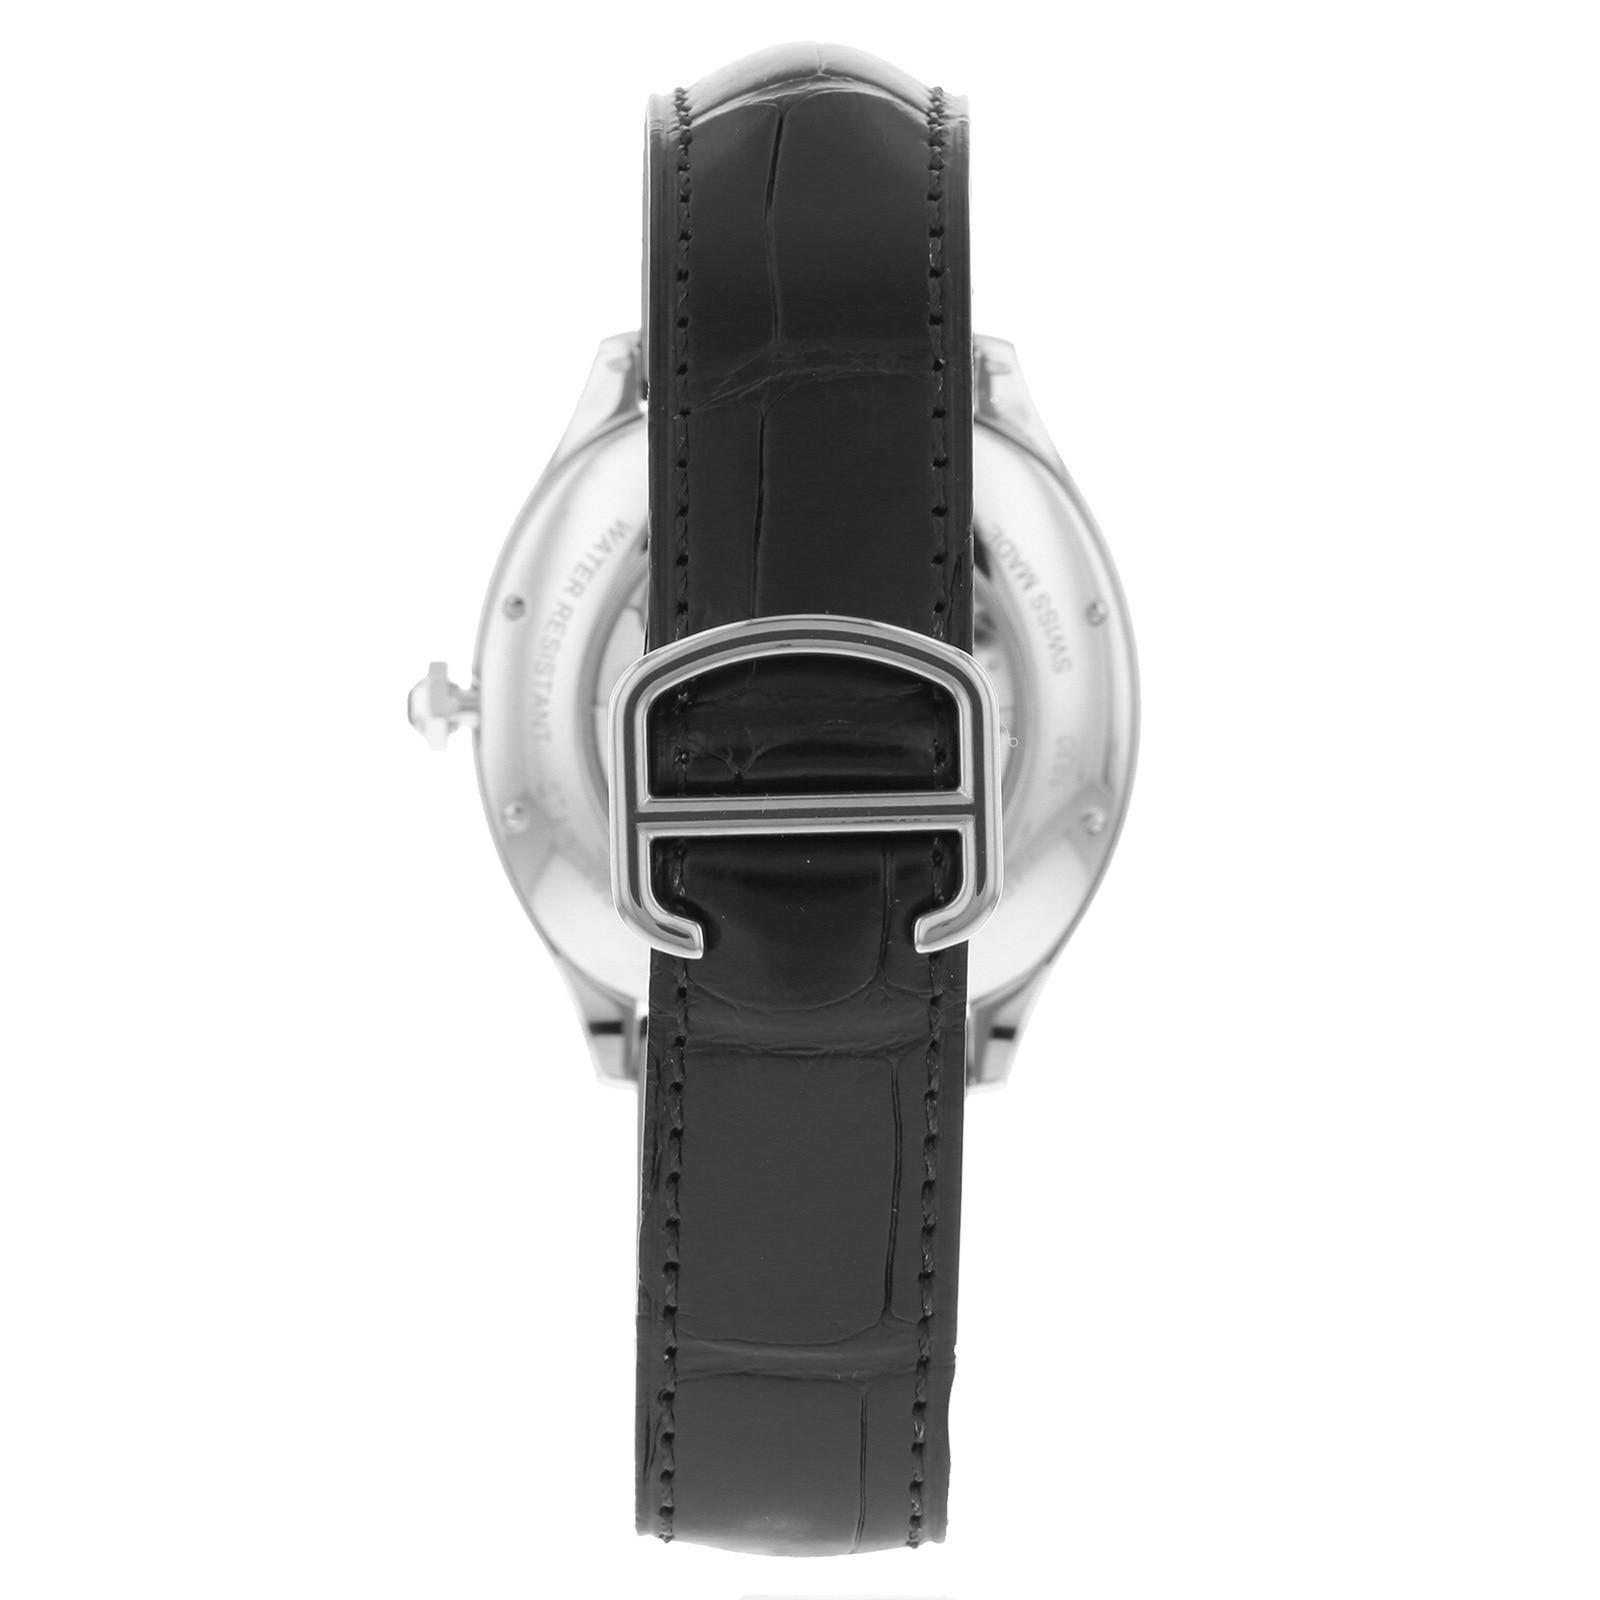 Cartier Drive de Cartier watch Steel, leather